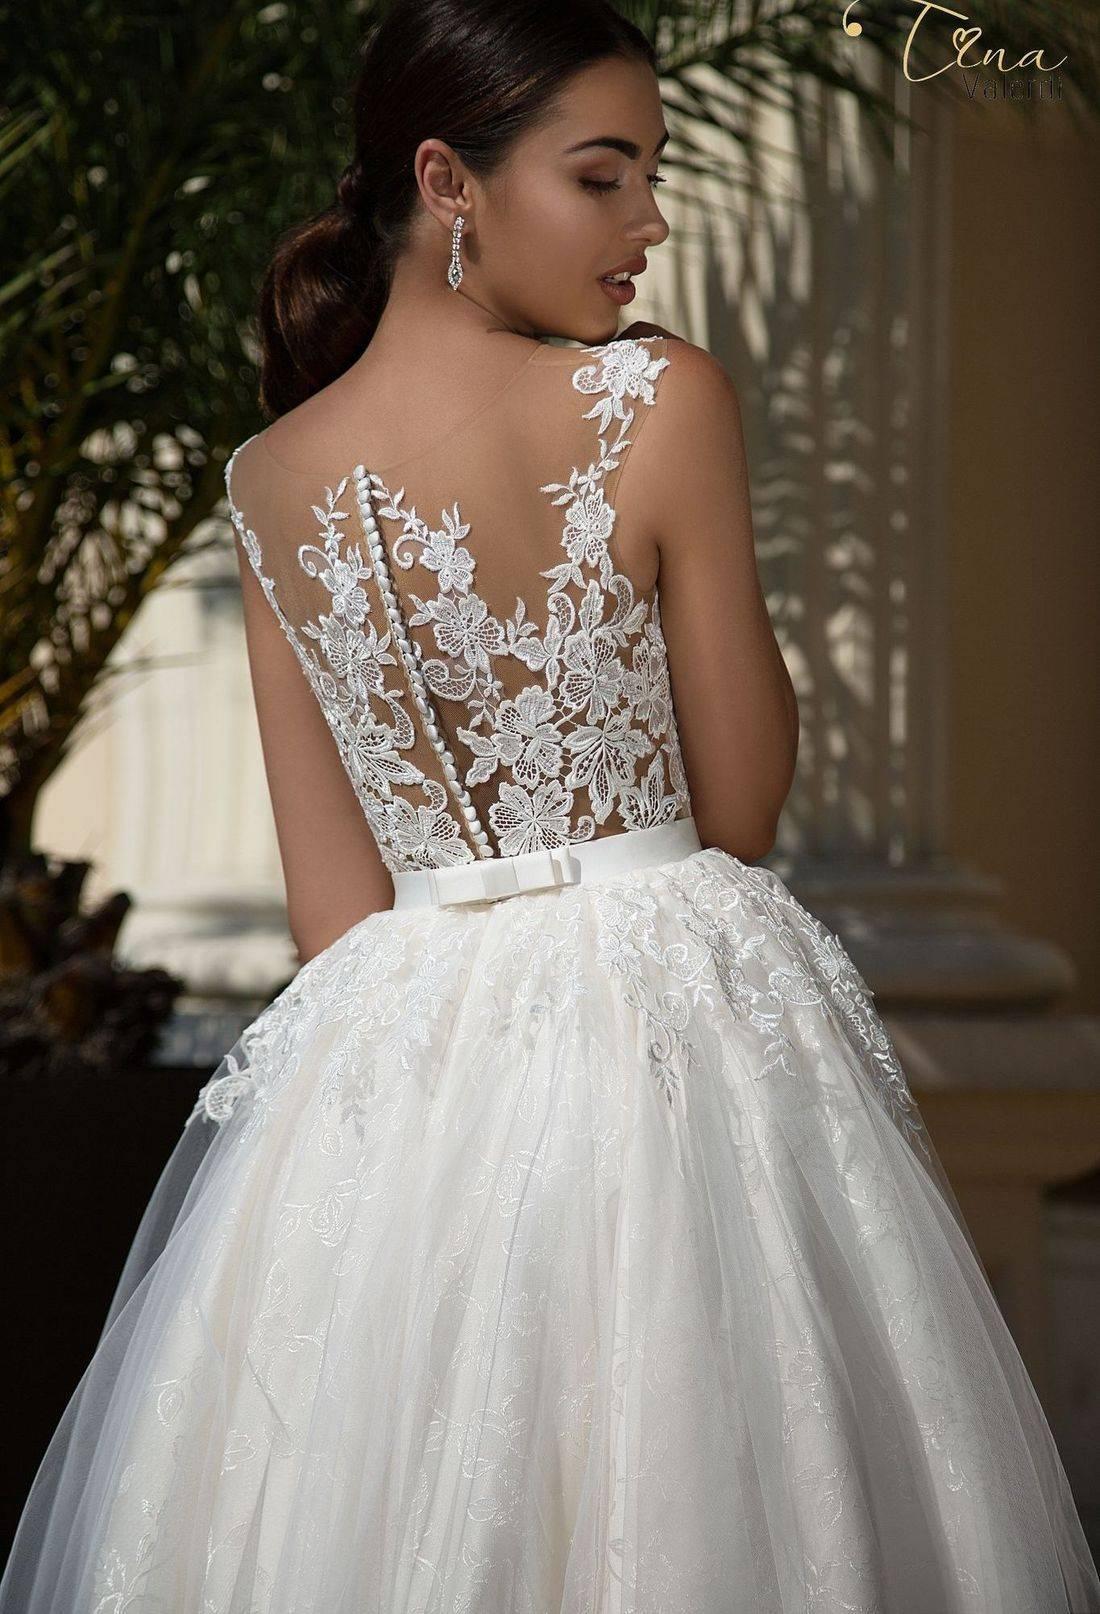 sexy wedding dresses,simple wedding dress,modest wedding dress,wedding dresses